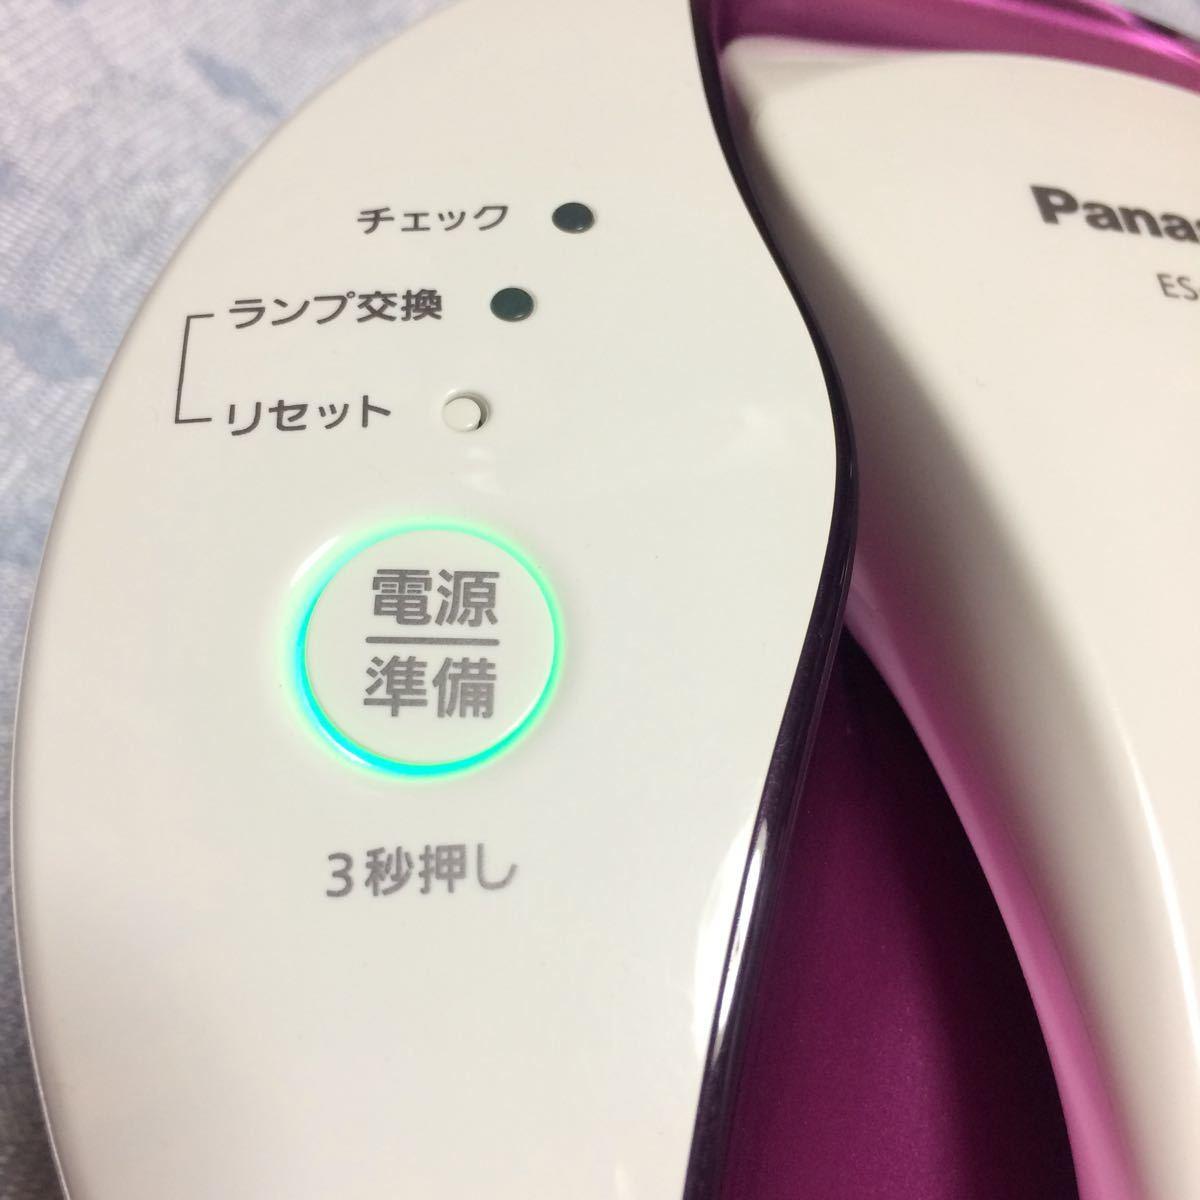 Panasonic フラッシュ光式脱毛器 ES-WH71 光エステ